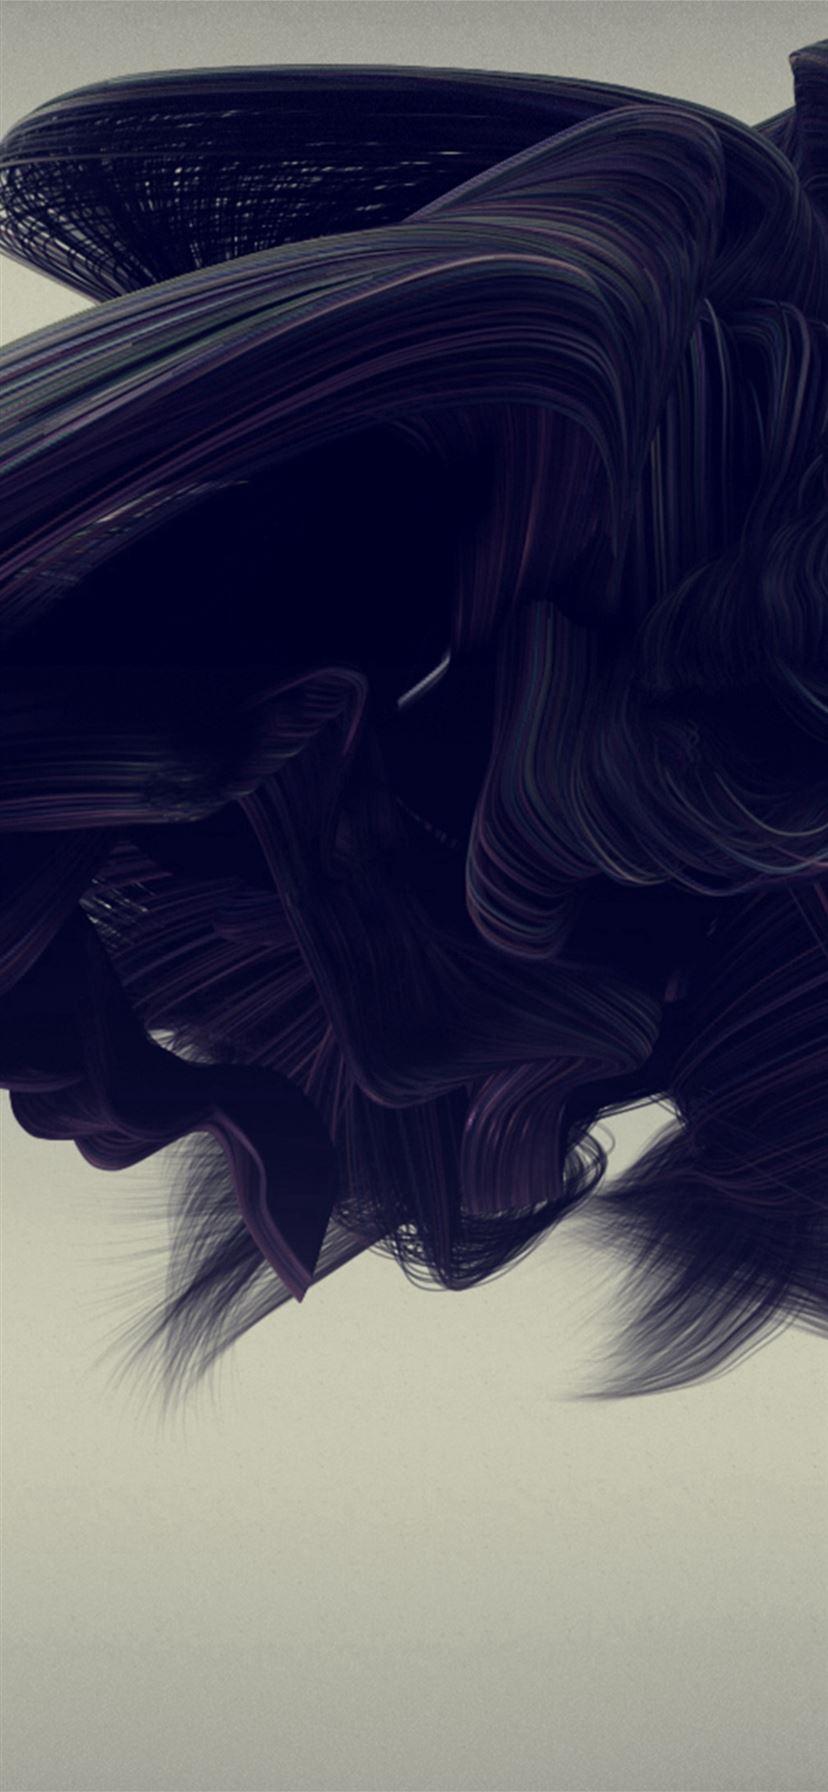 Pattern Digital Abstract Illustration Art iPhone 11 ...